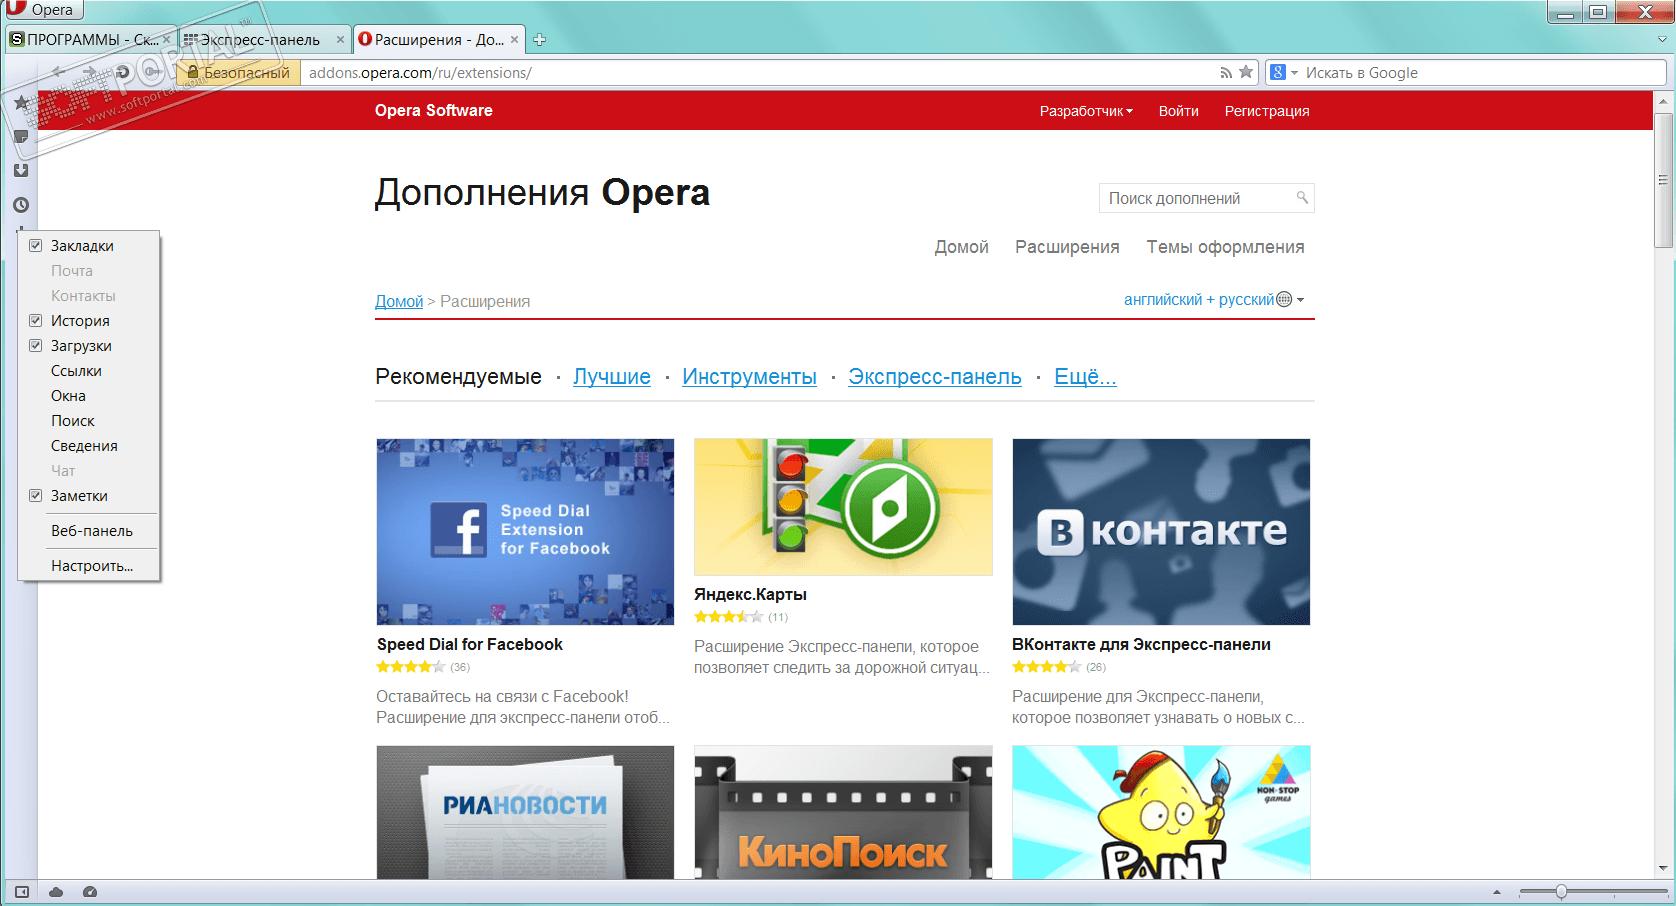 Opera 13 скачать бесплатно opera 13 rus